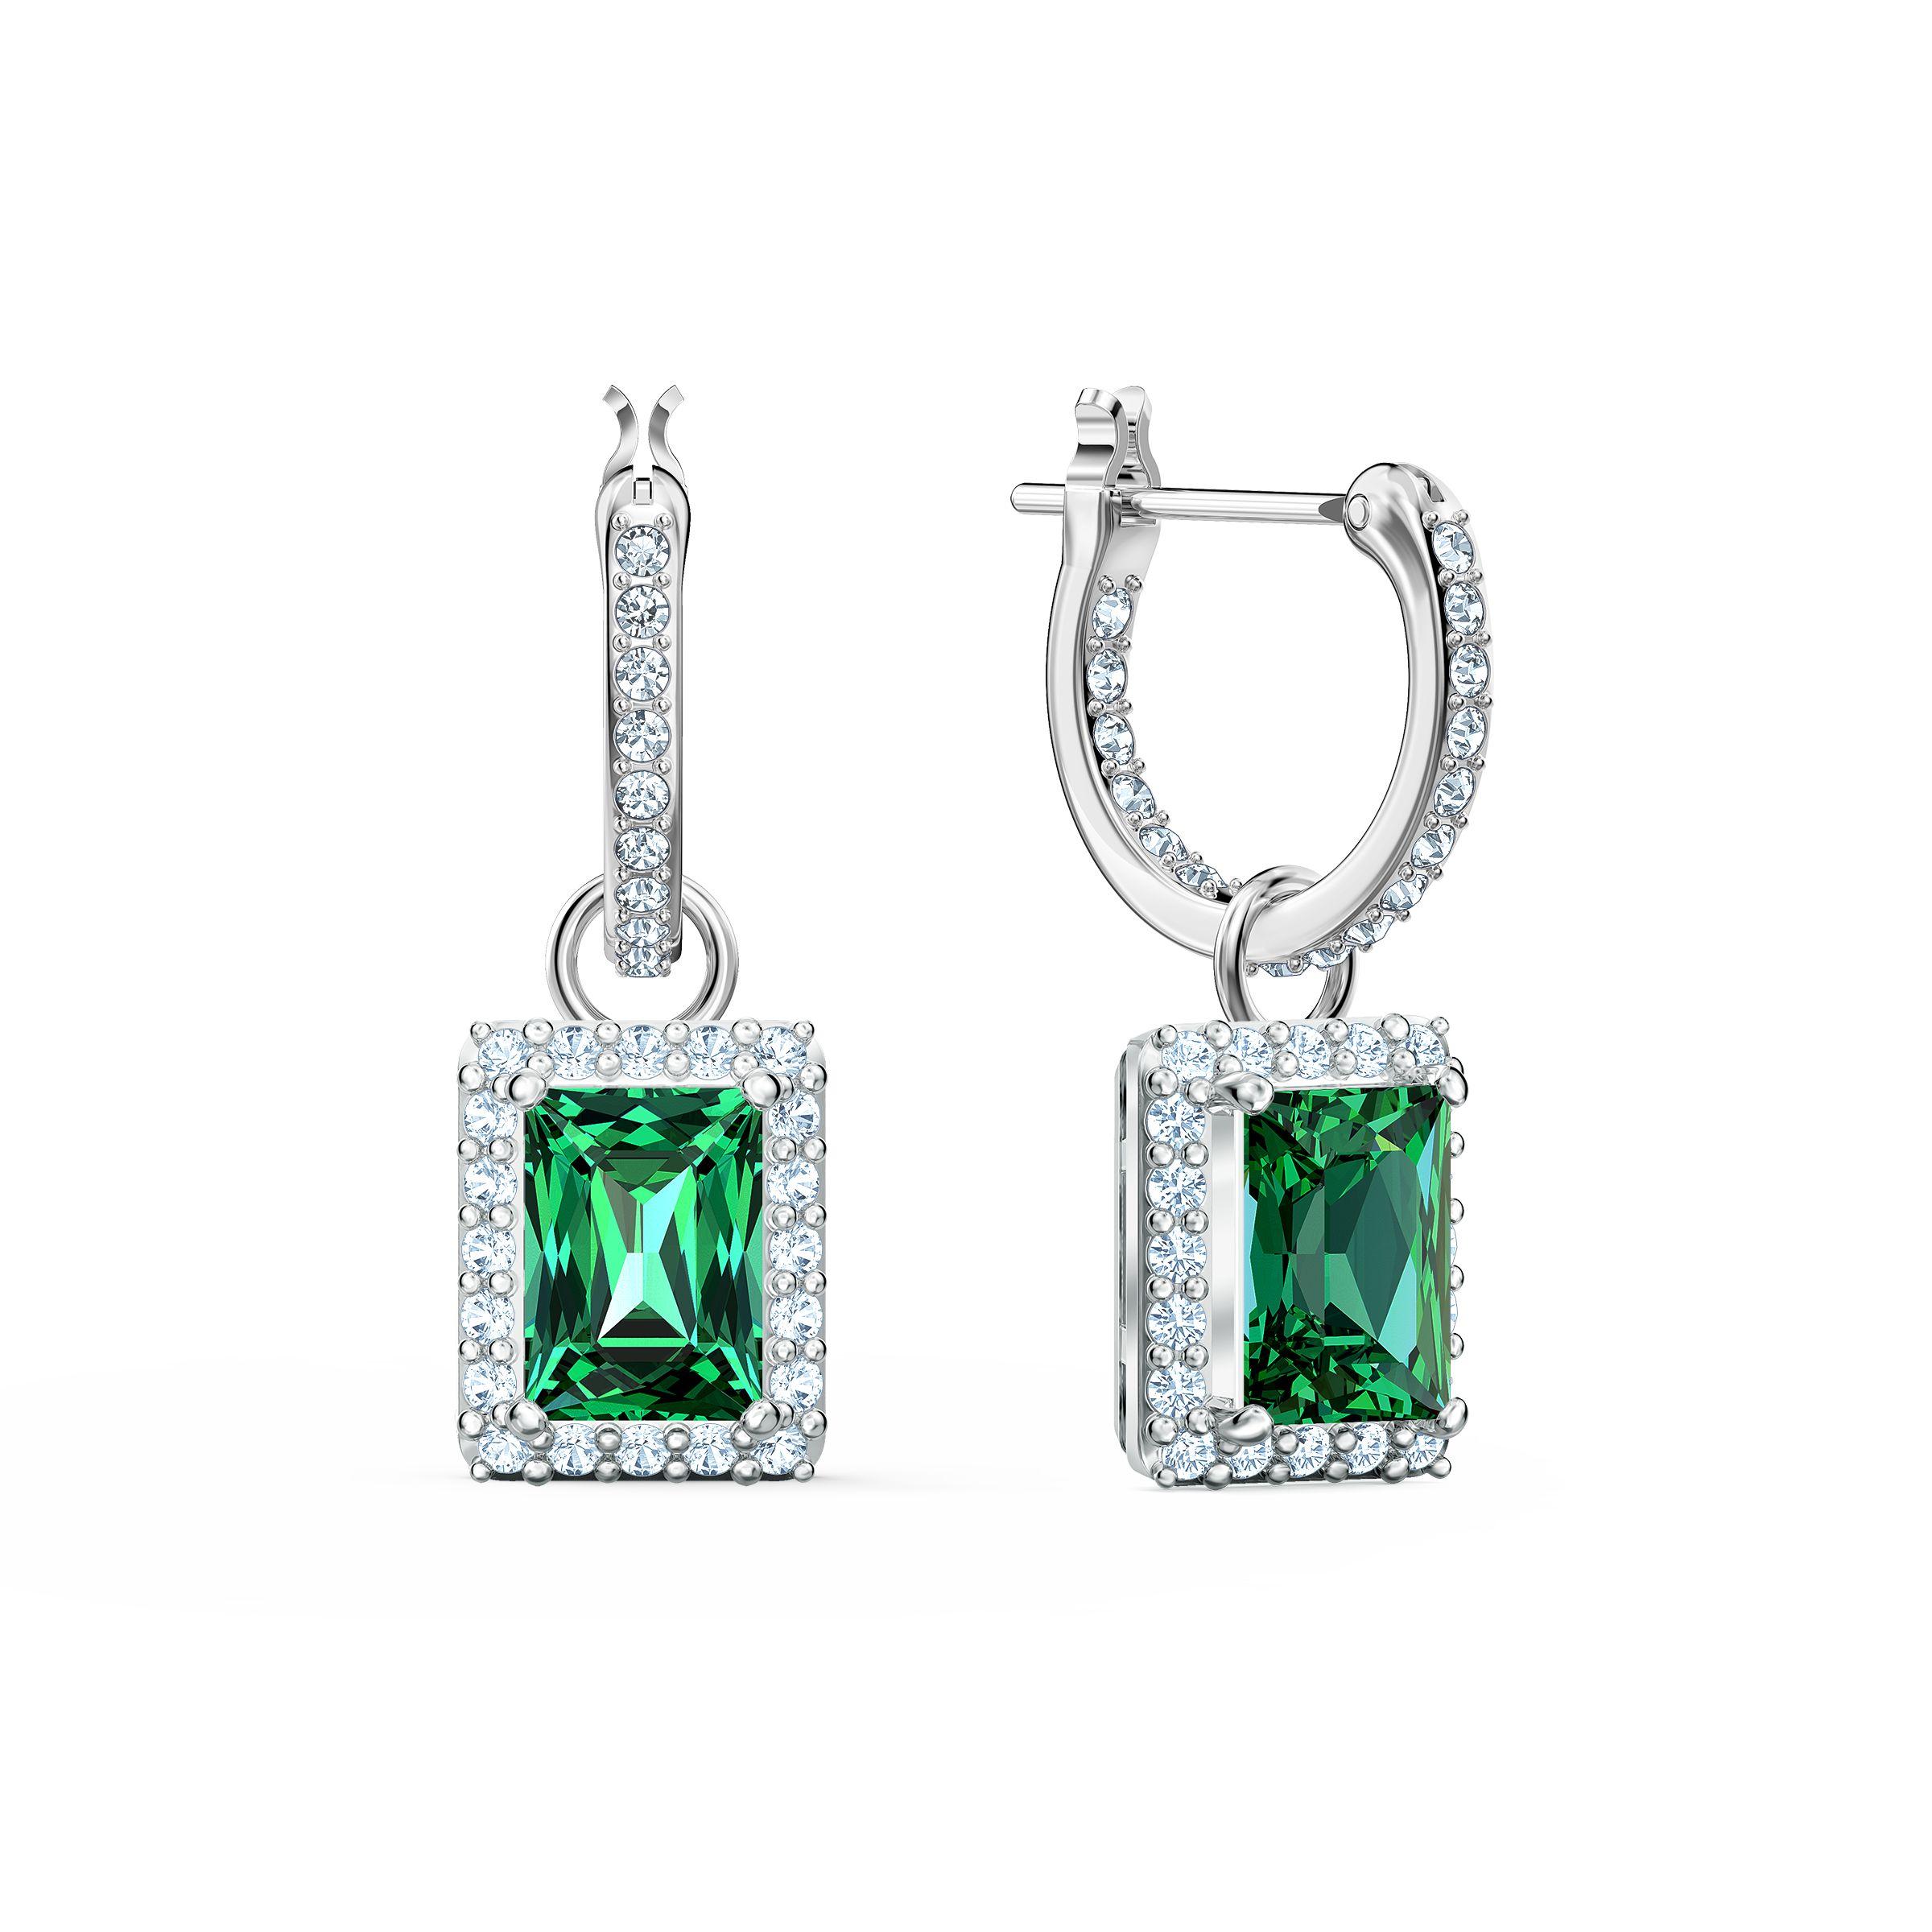 Boucles d'oreilles Angelic Rectangular, vert, métal rhodié, Swarovski